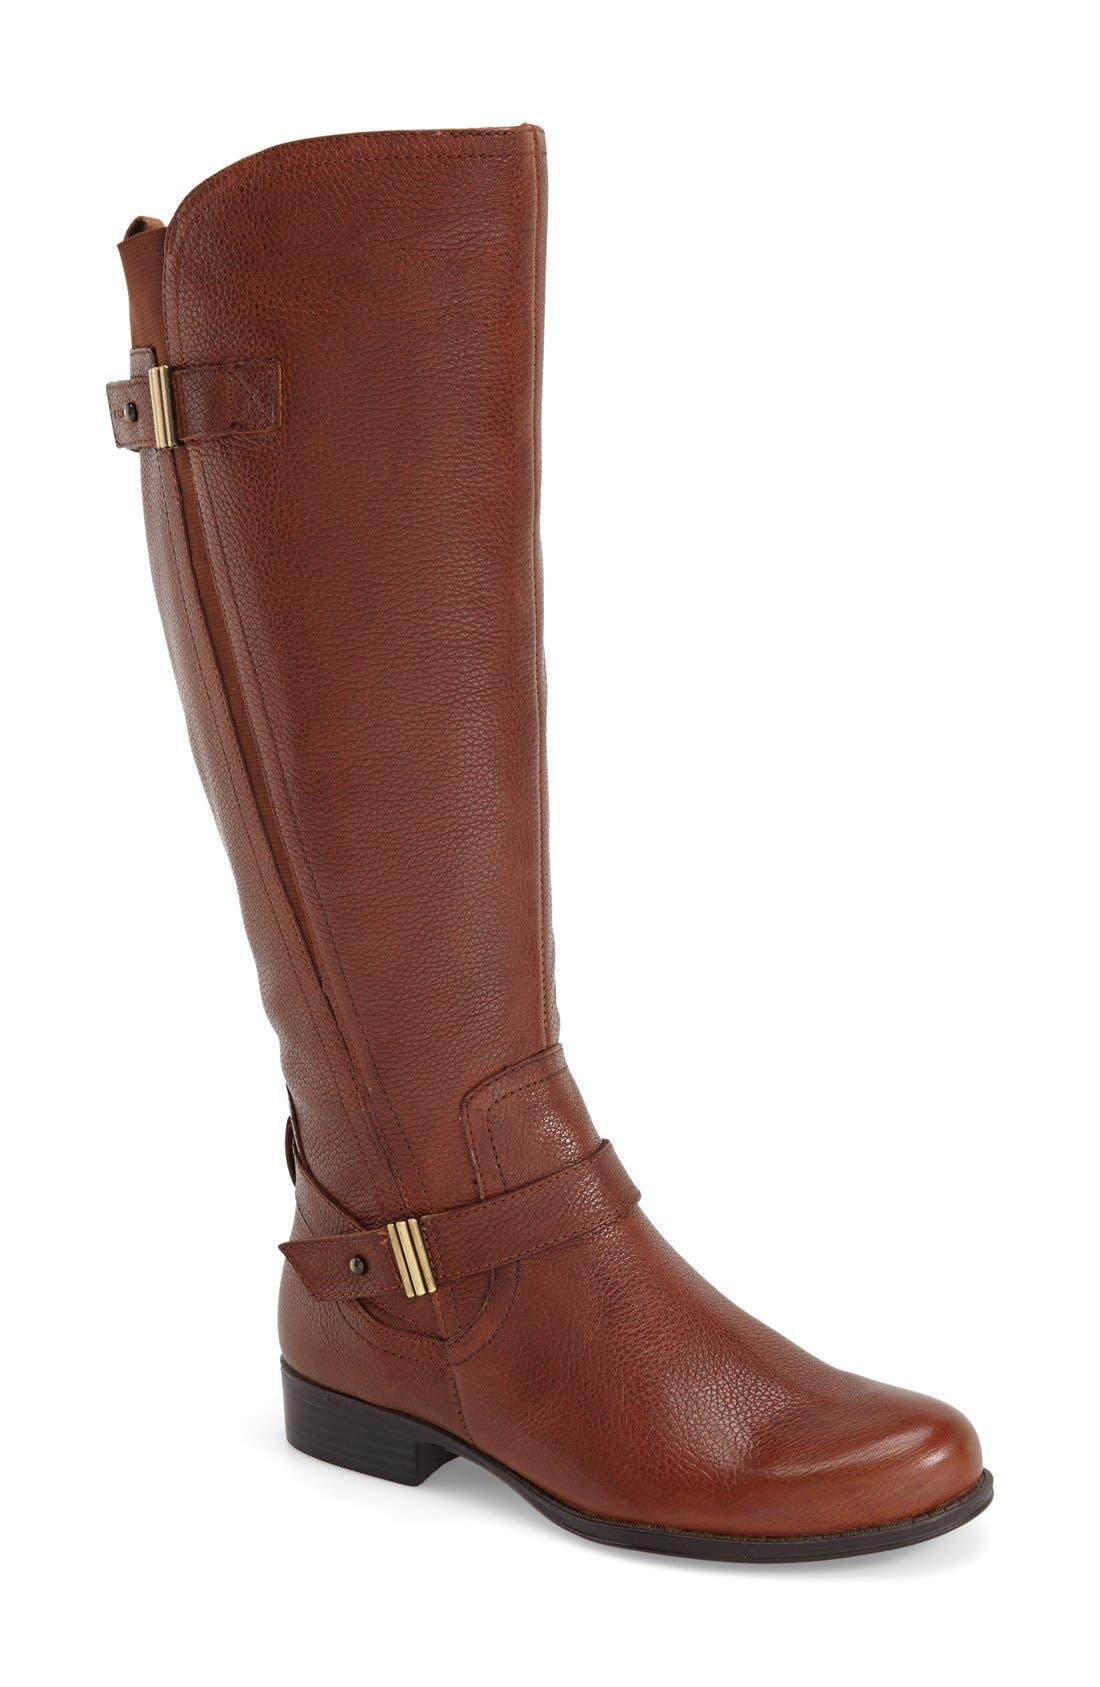 Main Image - Naturalizer 'Joan' Riding Boot (Women) (Wide Calf)